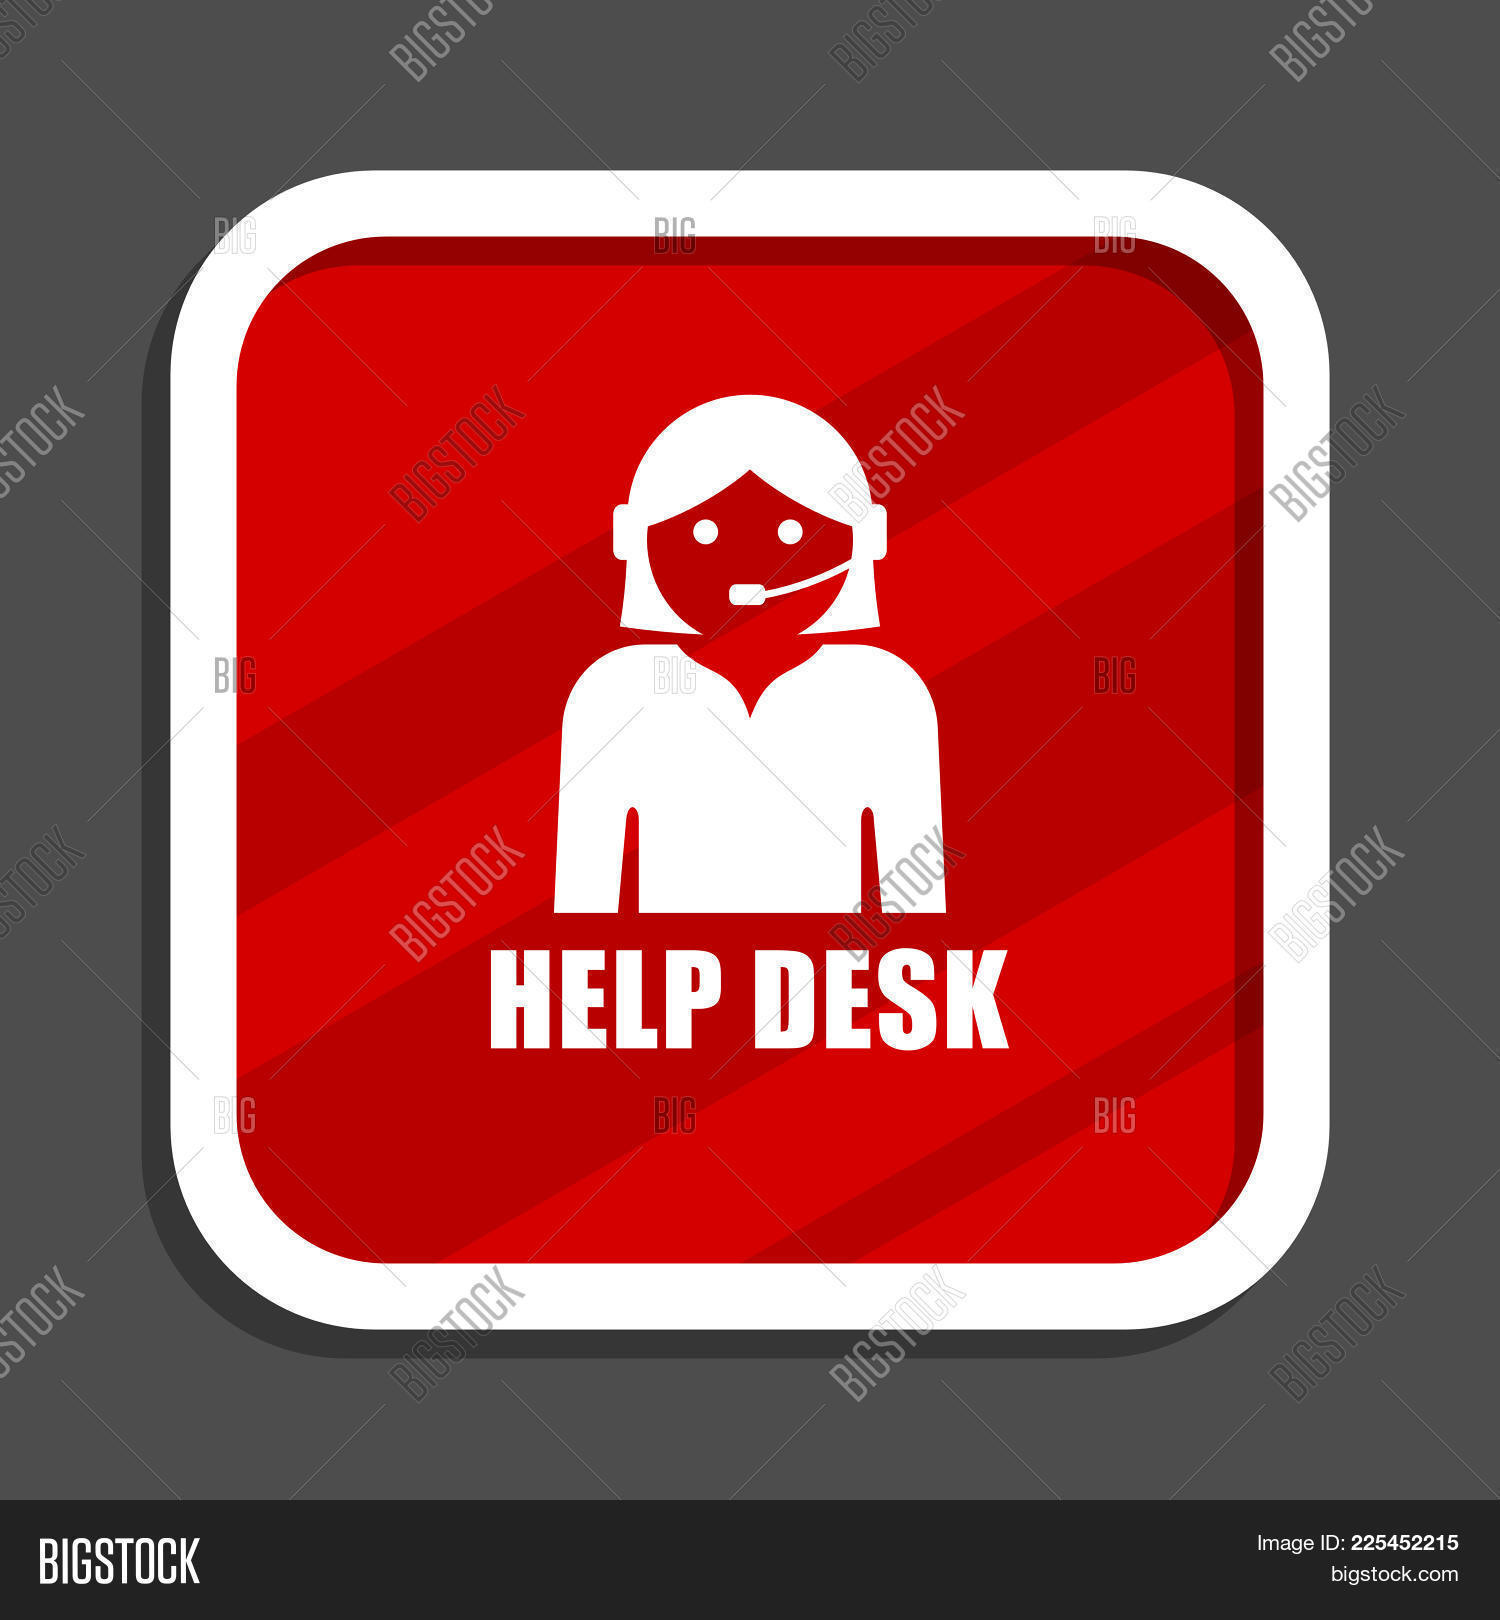 Help Desk Icon. Flat Design Square Internet Banner.